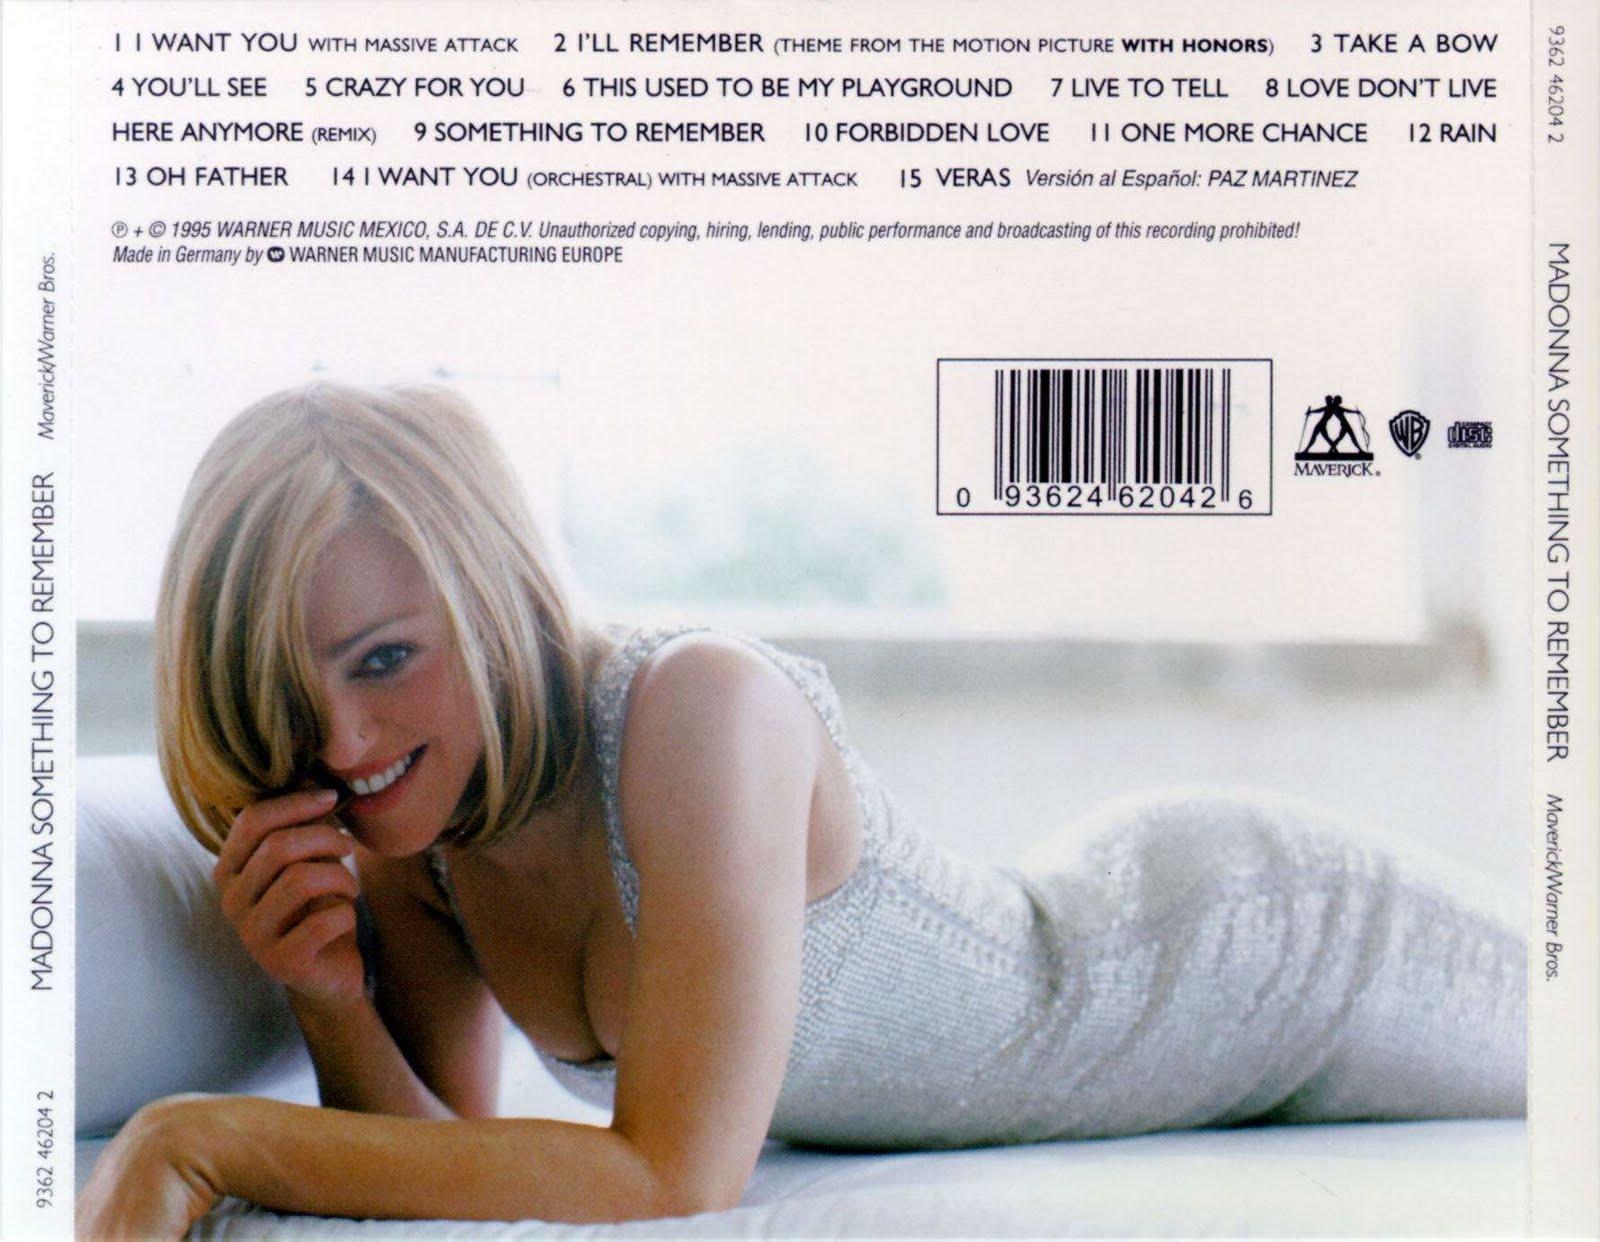 http://4.bp.blogspot.com/_iq2dPelCNxM/THBK4qynfnI/AAAAAAAAAQU/_uwaS0SCpoA/s1600/Madonna-Something-To-Remember-Trasera.jpg